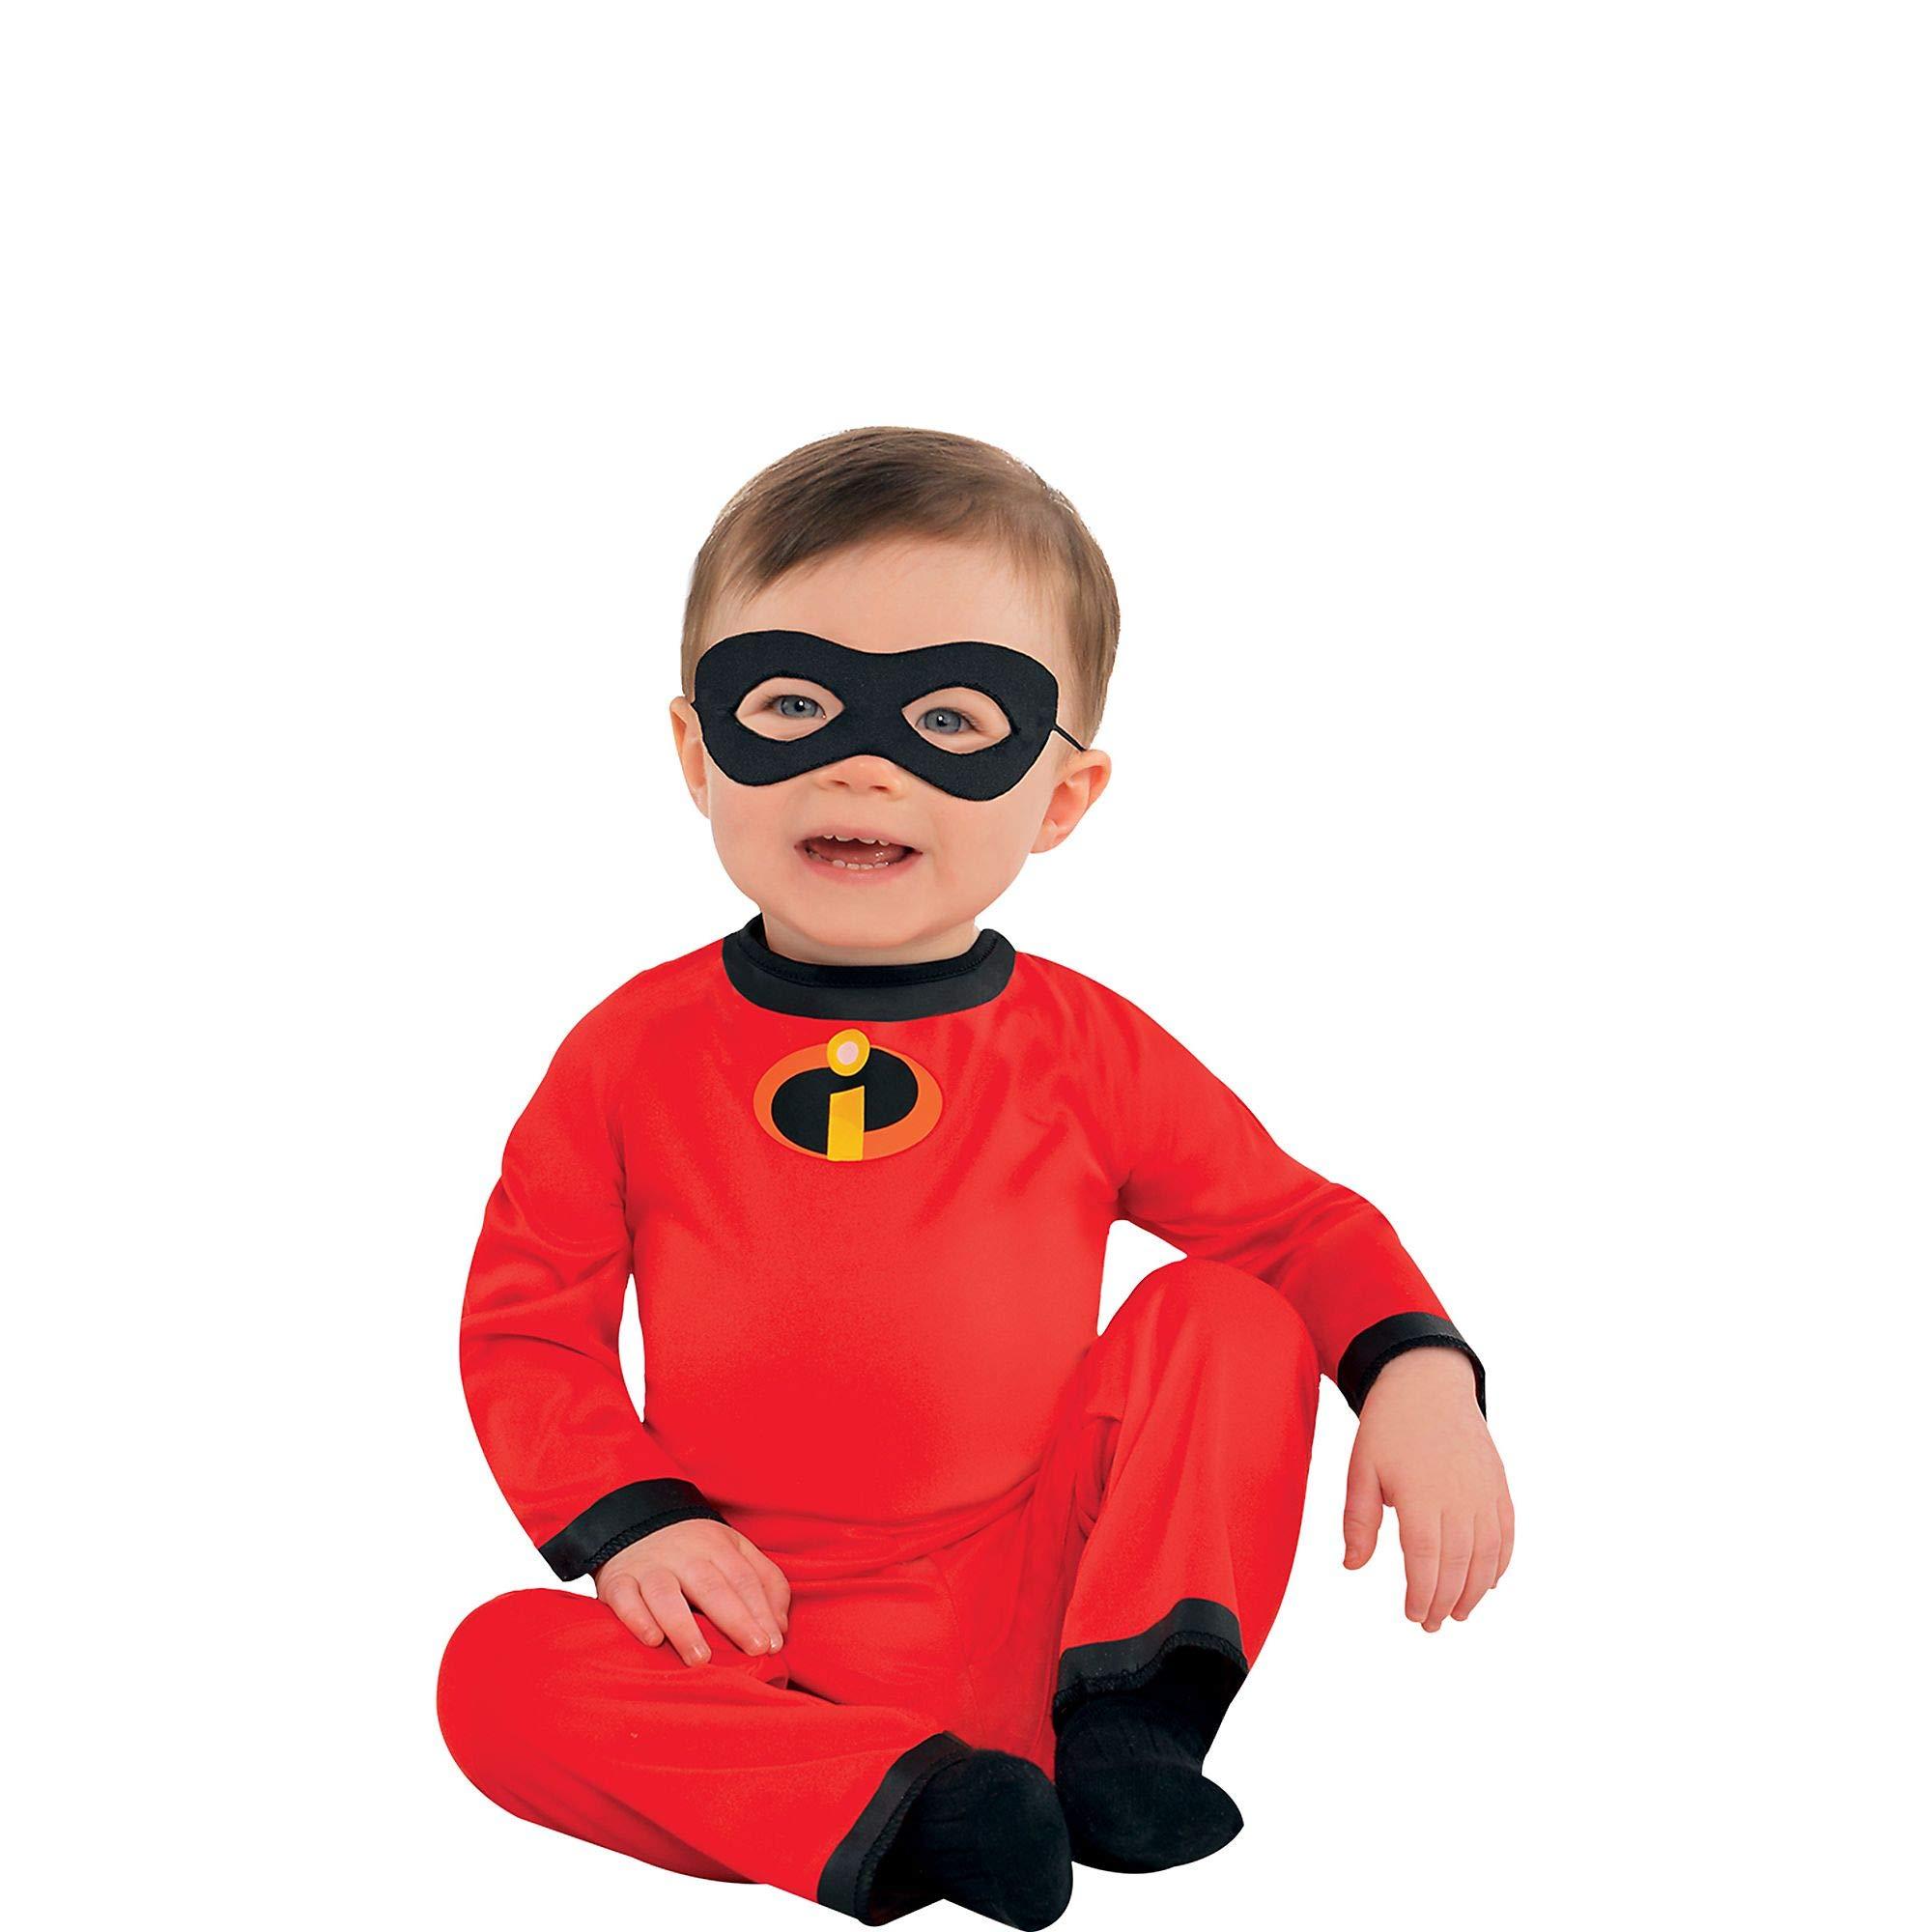 Amscan The Incredibles Baby Jack Jack Ha Buy Online In Bahamas At Desertcart